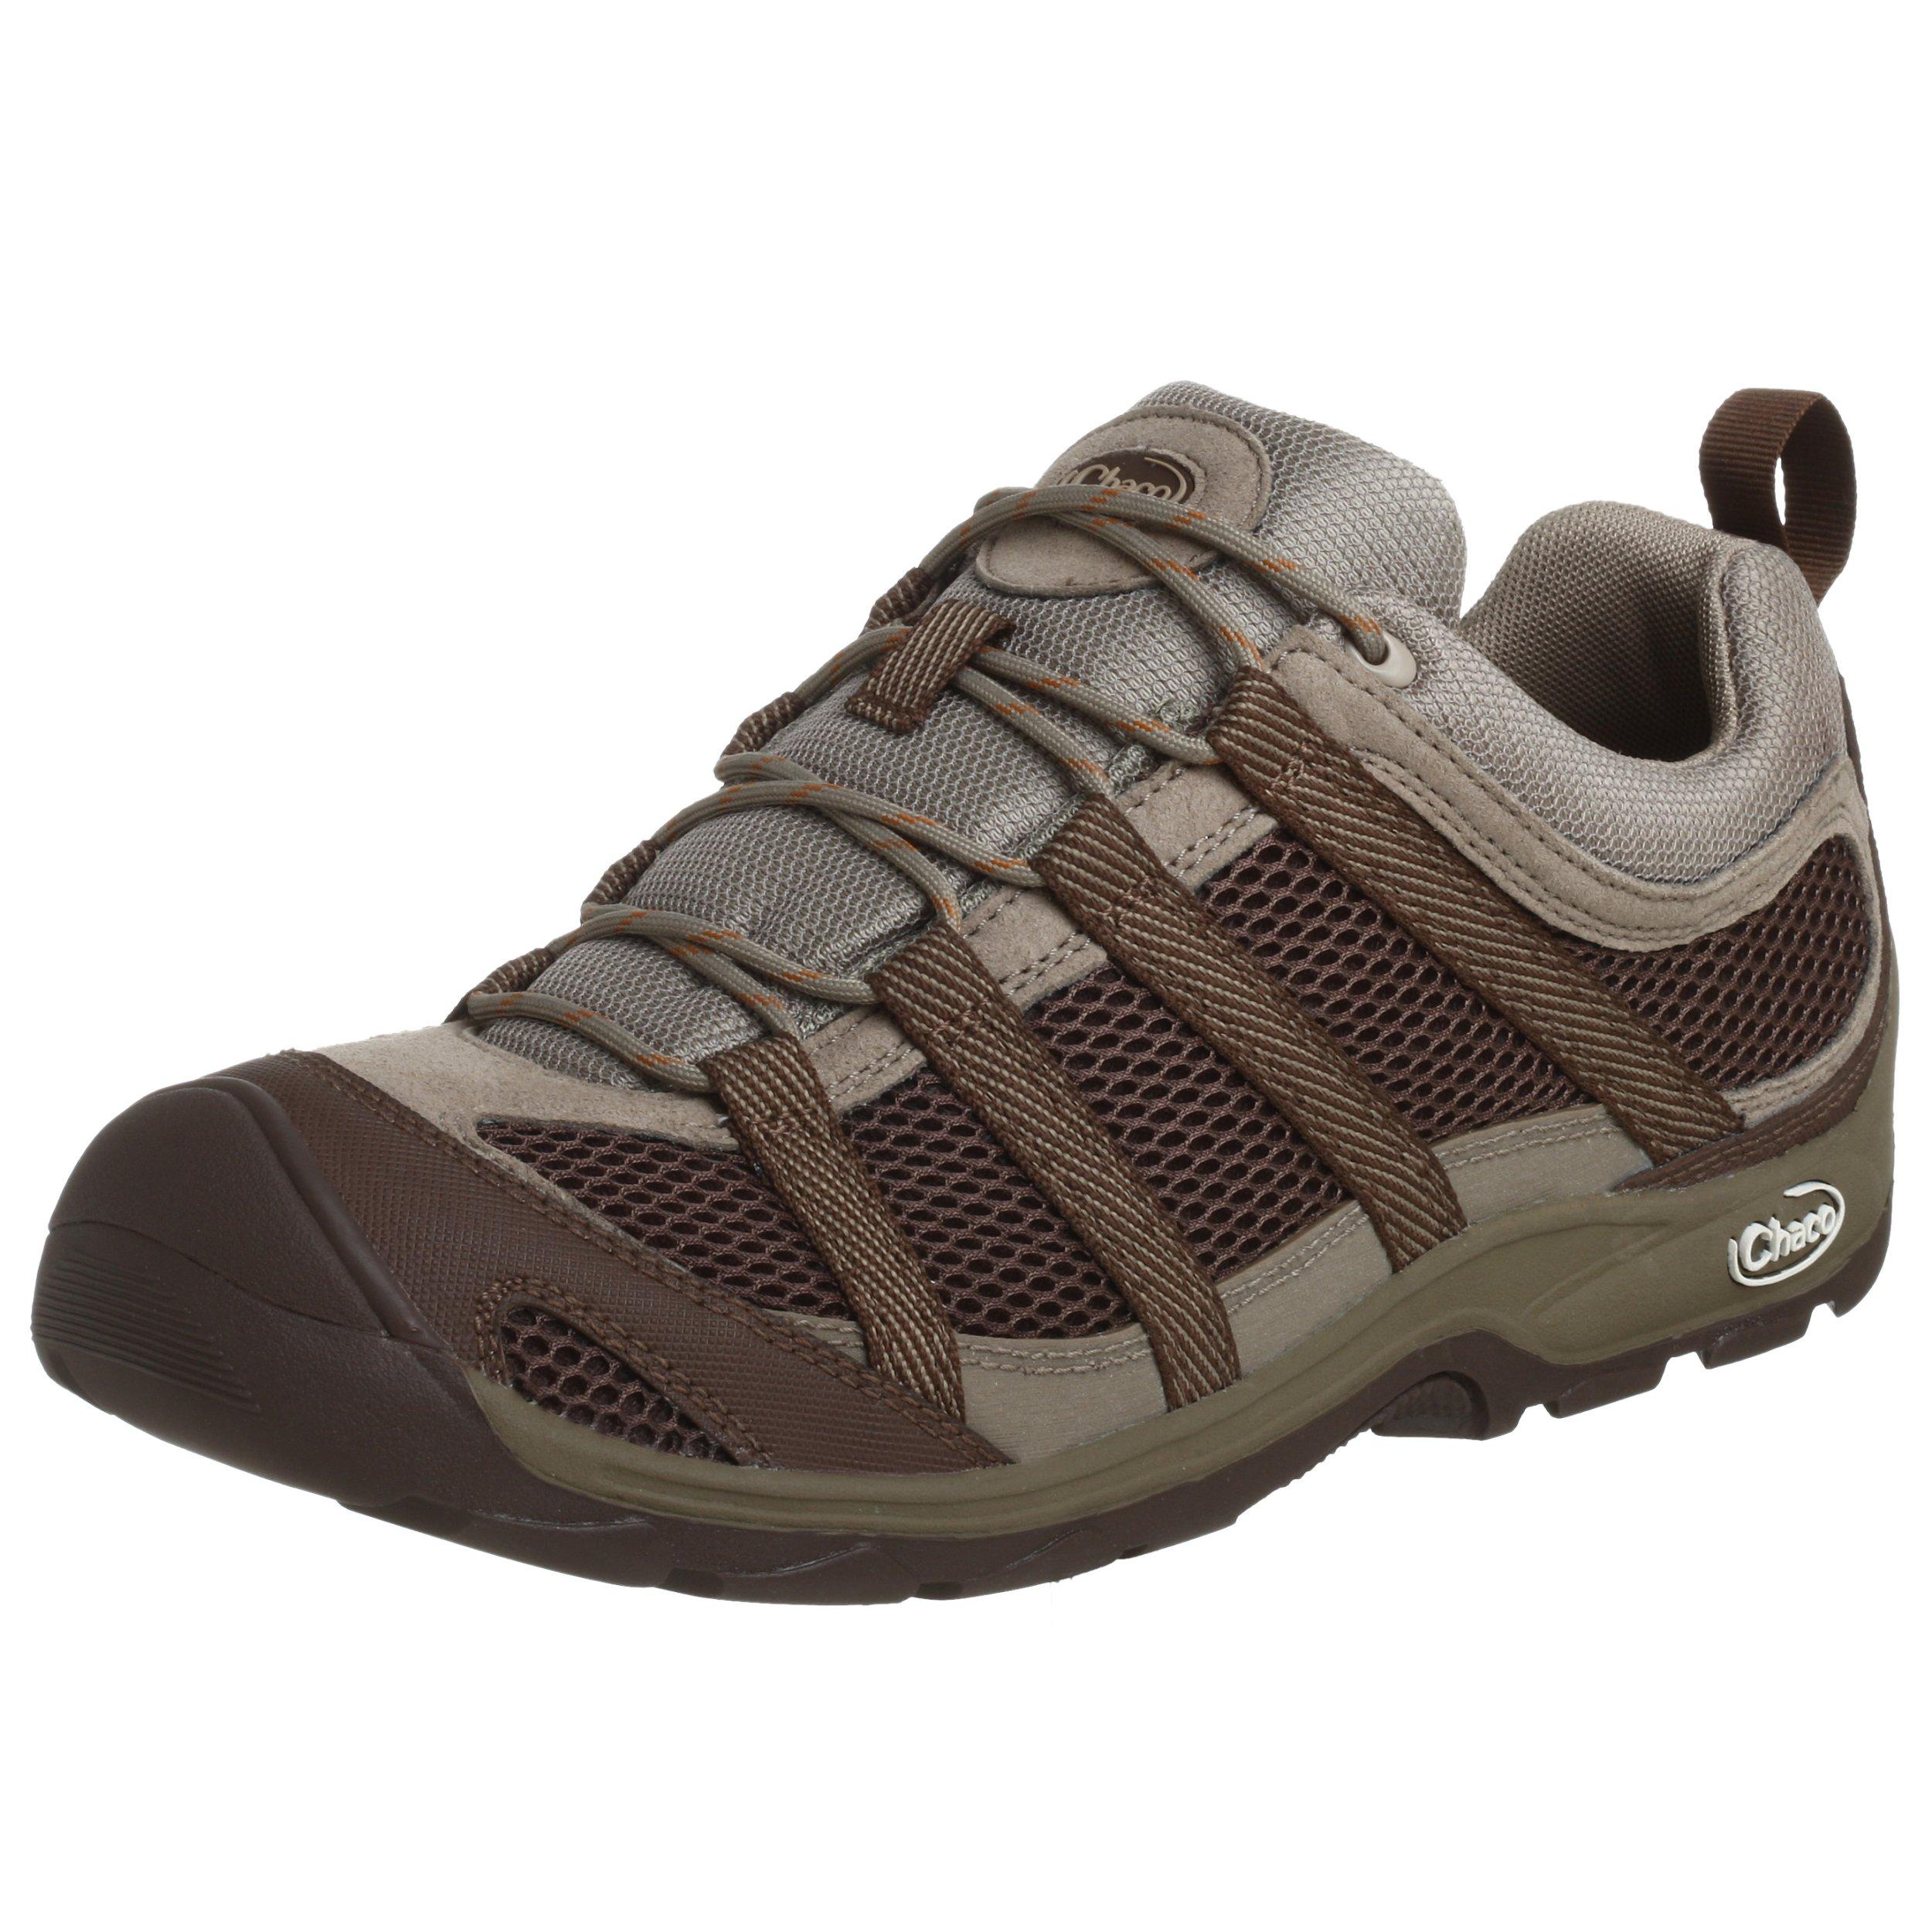 Chaco Men's Redrock Sneaker,Strata,11 M